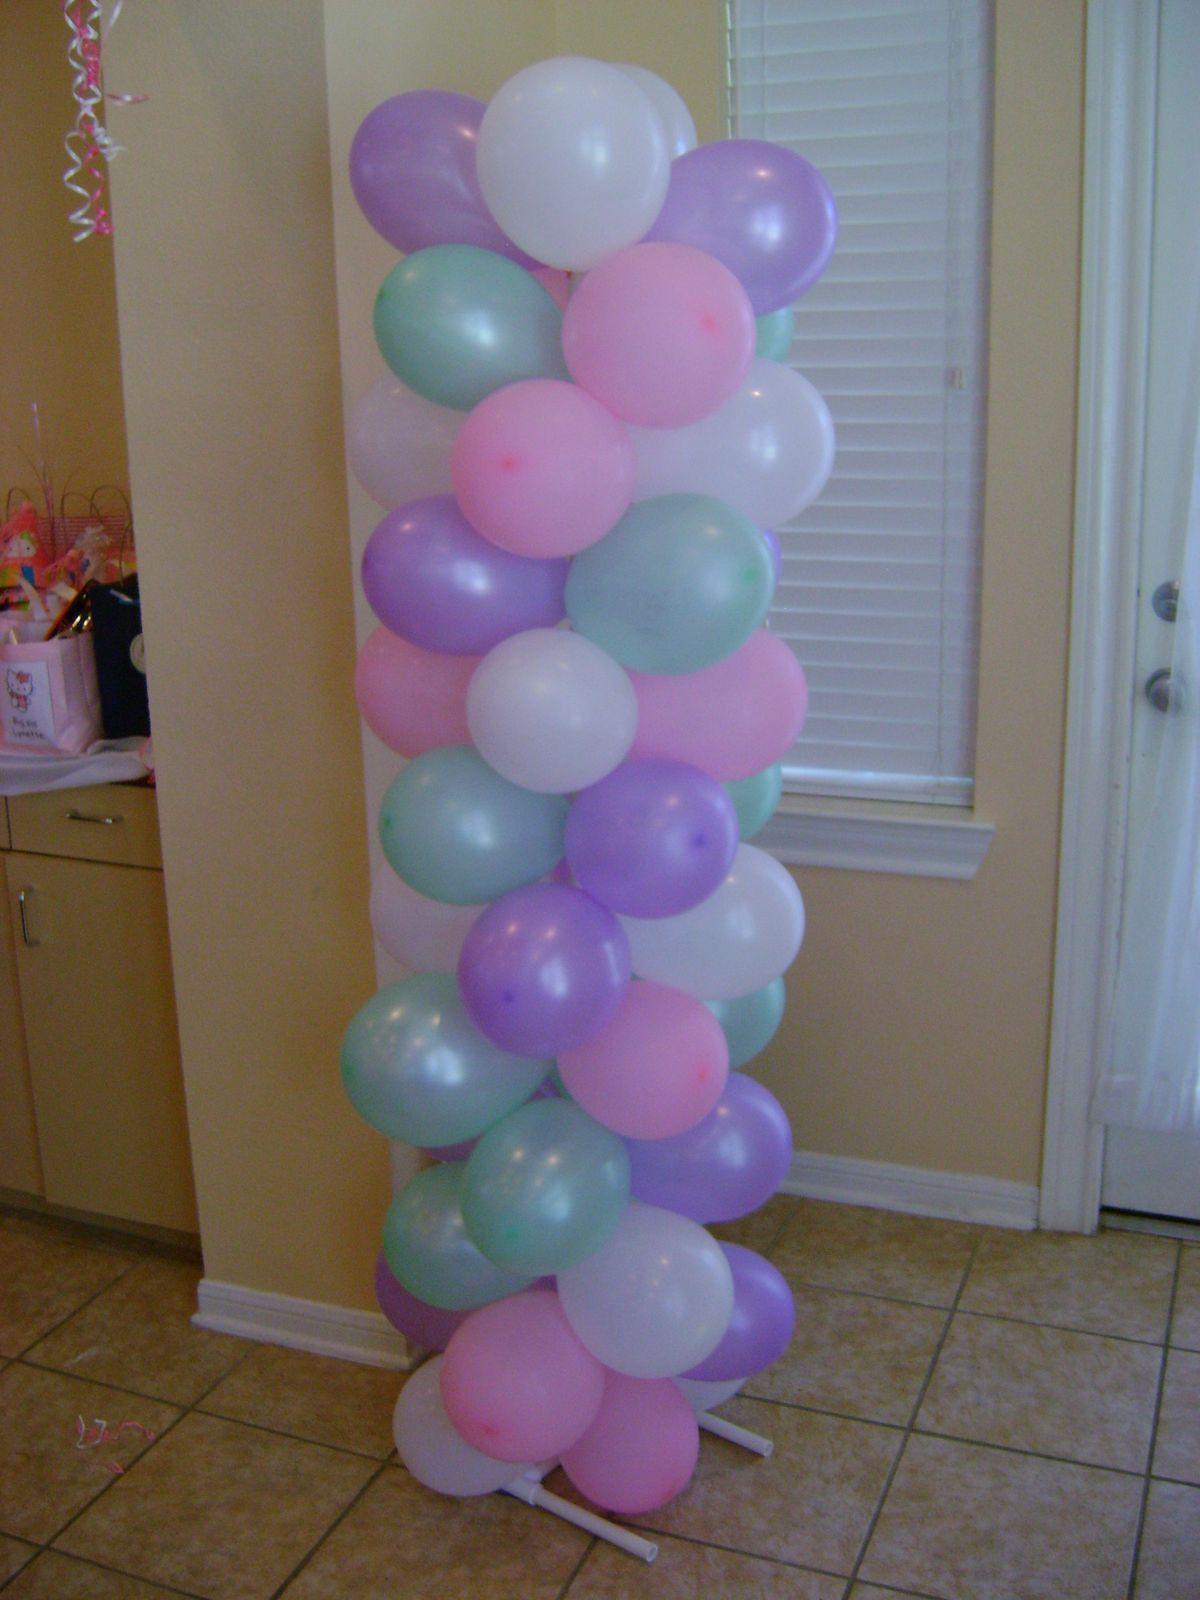 Diy balloon columns - Balloon Columns Balloon Arches And Balloon Columns